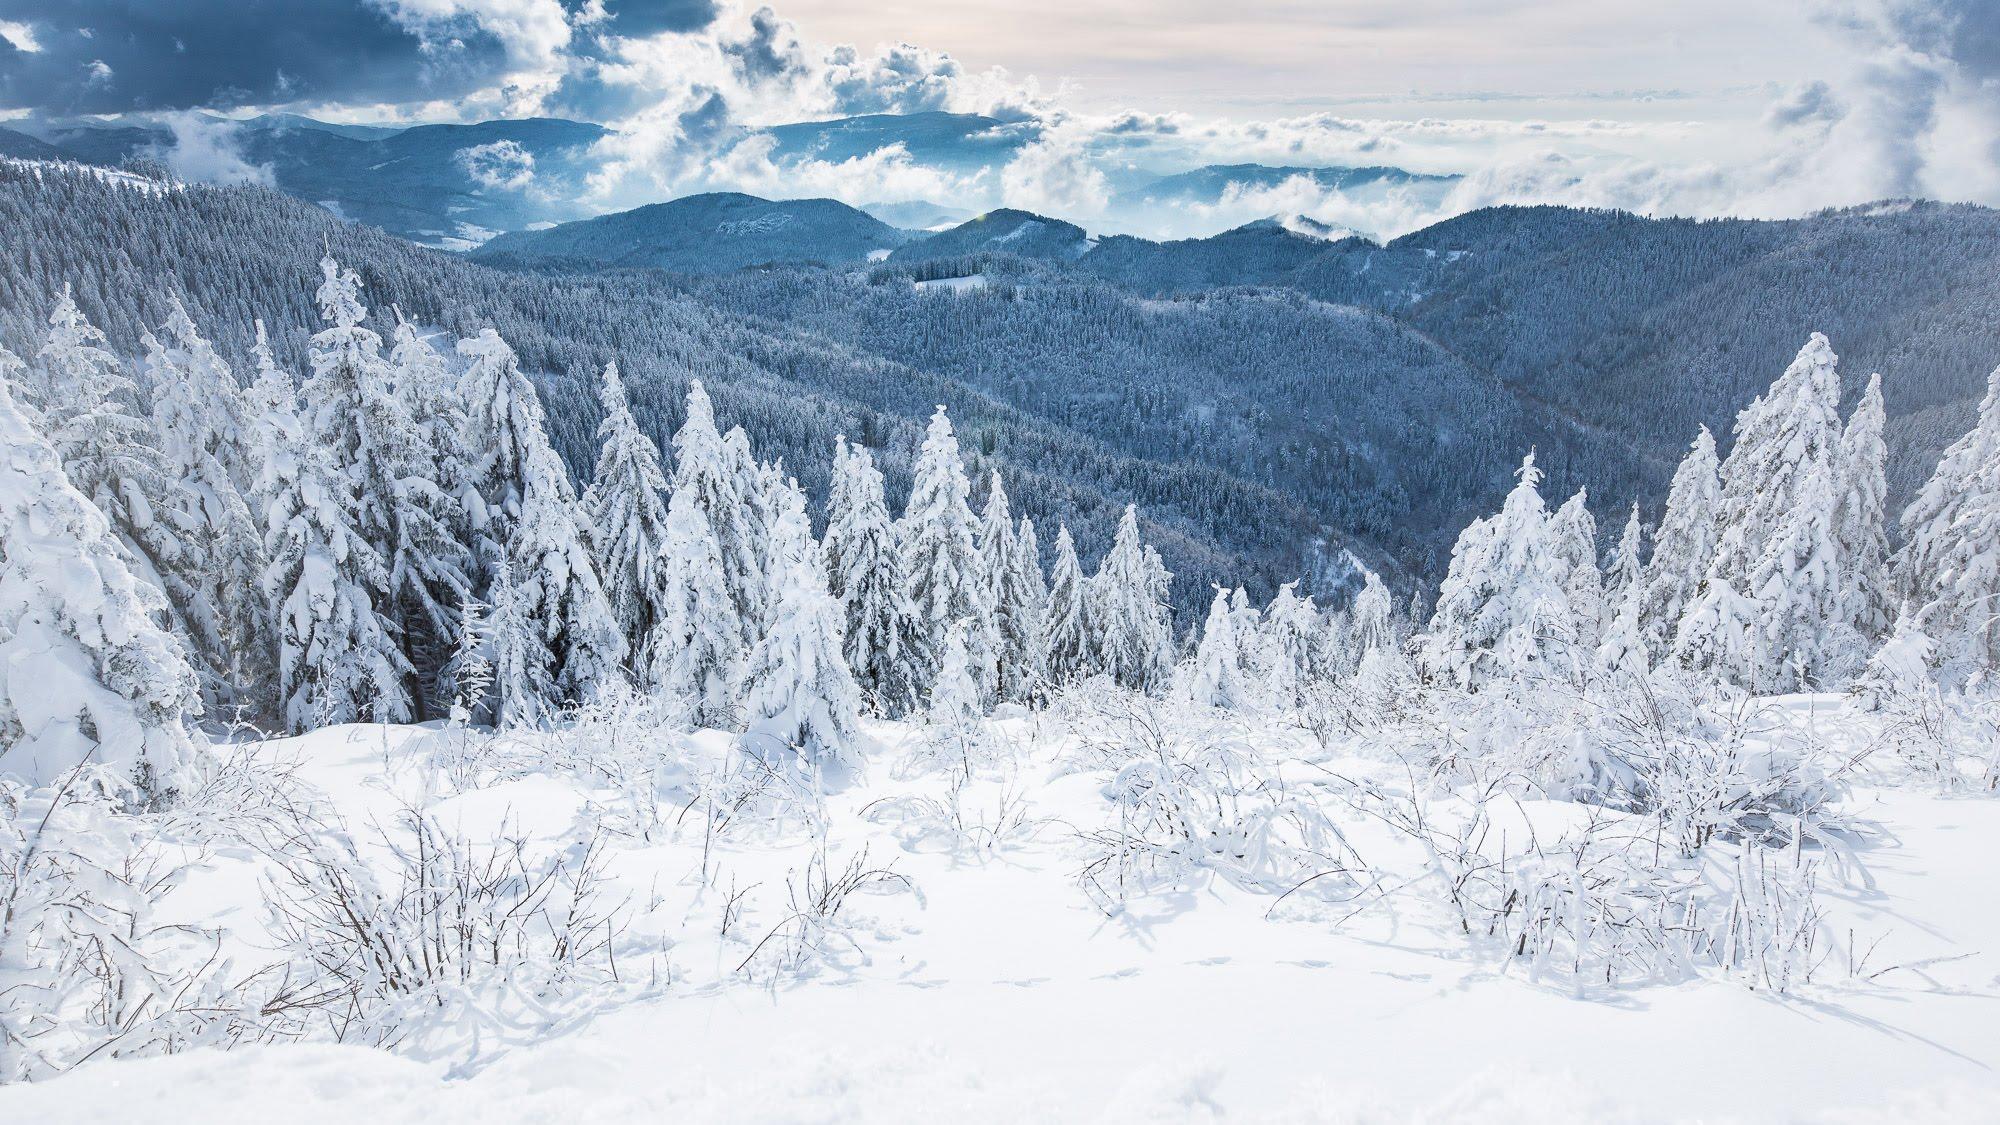 WINTER | Black Forest National Park - YouTube